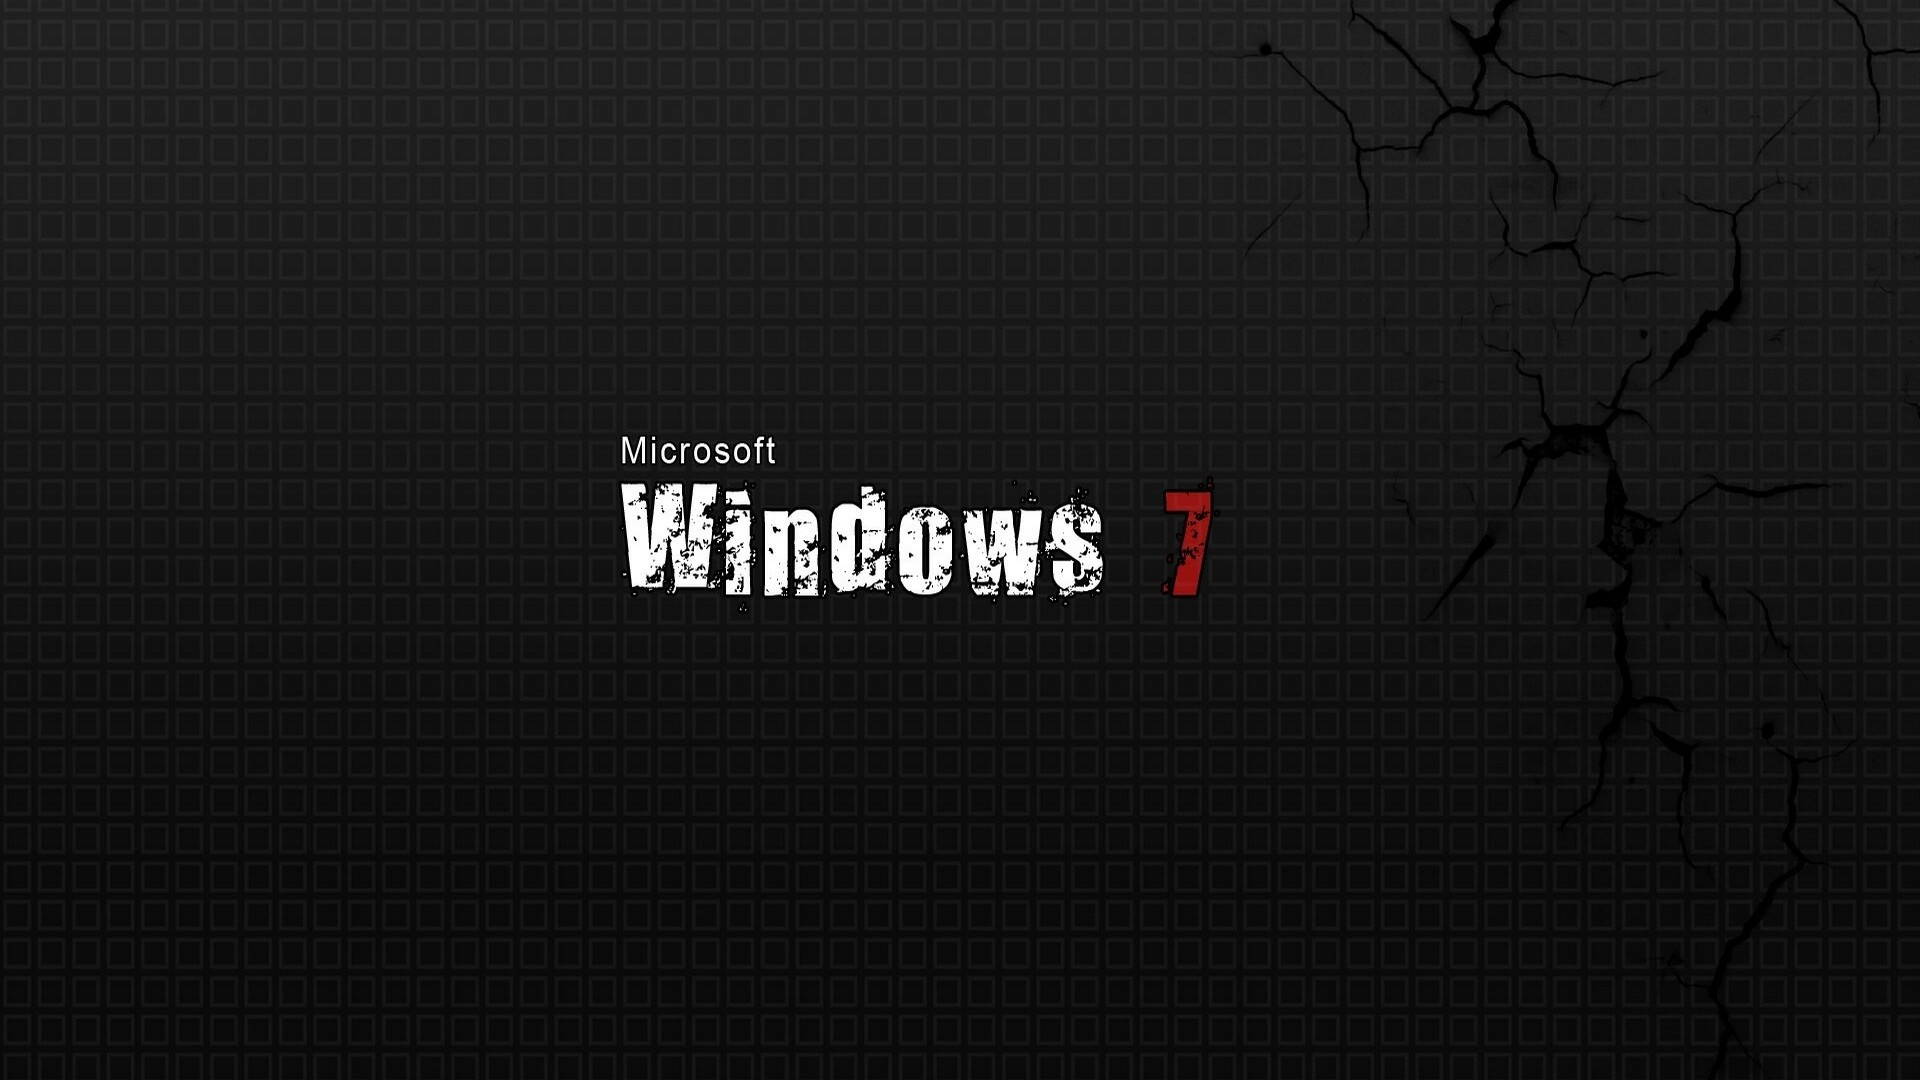 Wallpaper windows 7, white, black, red